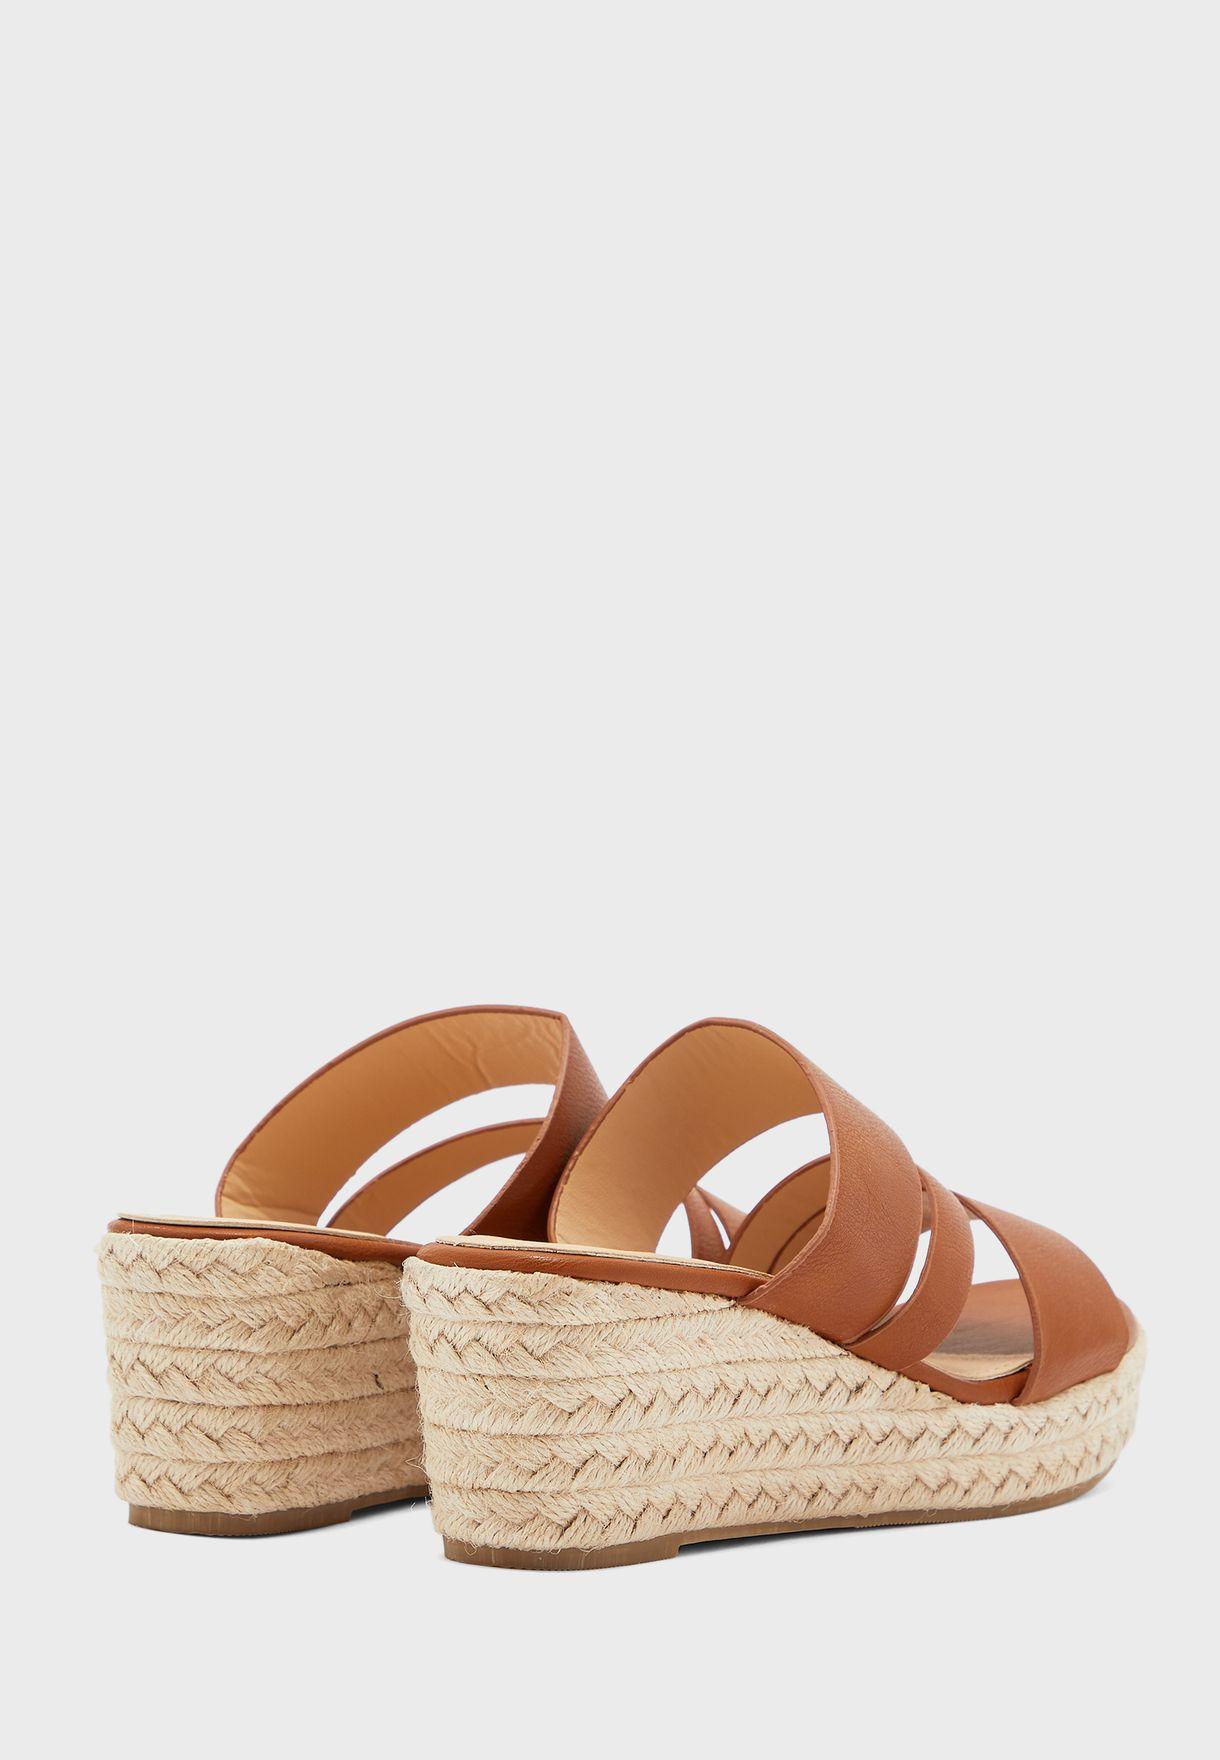 Espadrille Wedge Mule Sandals